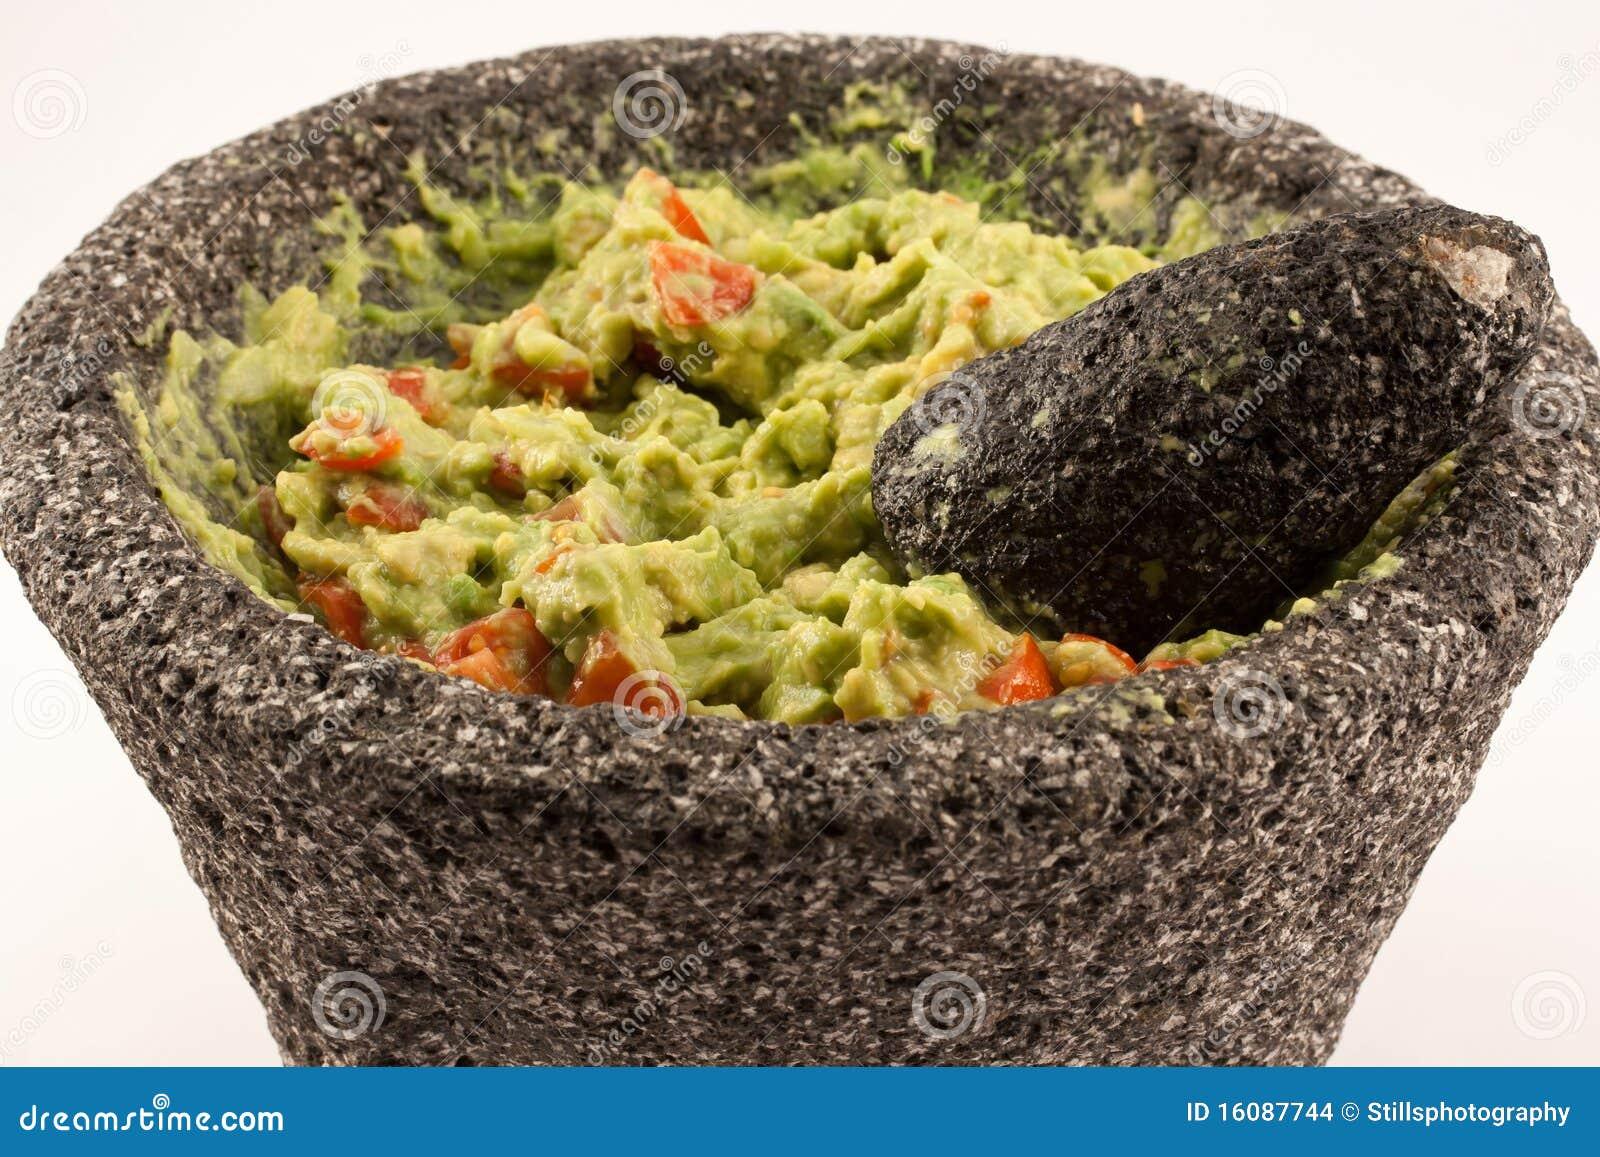 Guacamole In Molcajete Stock Photo. Image Of Fresh, Salsa